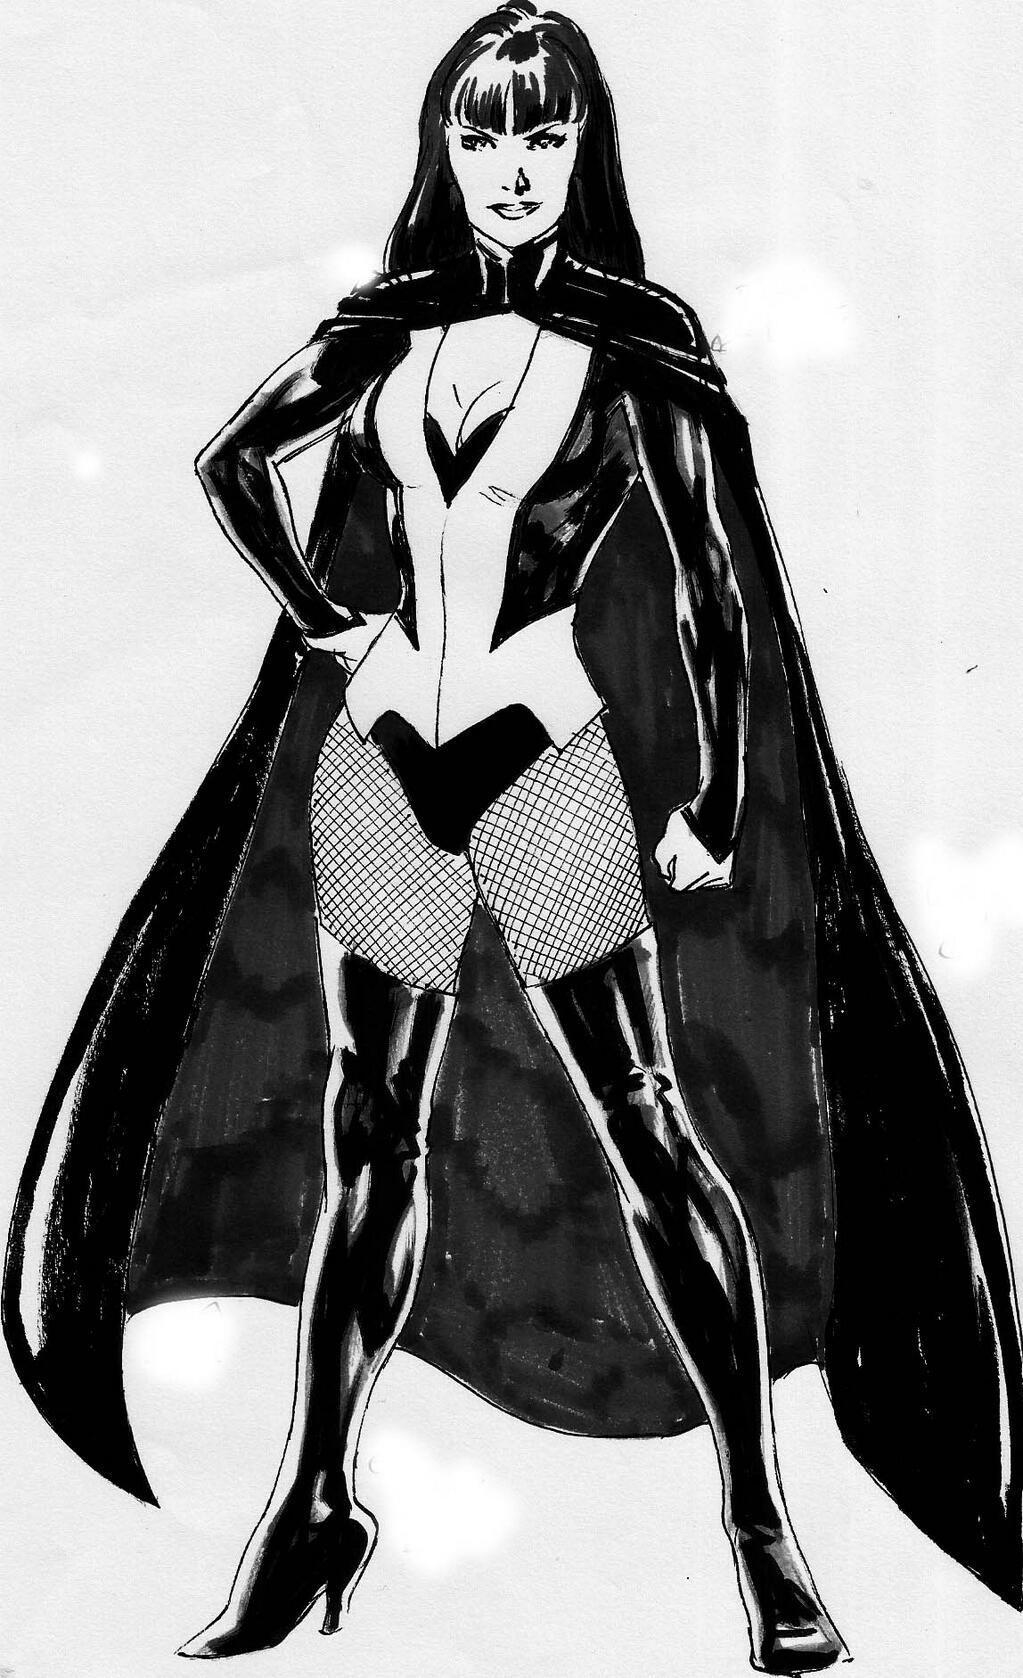 zatanna justice league heroes - photo #18